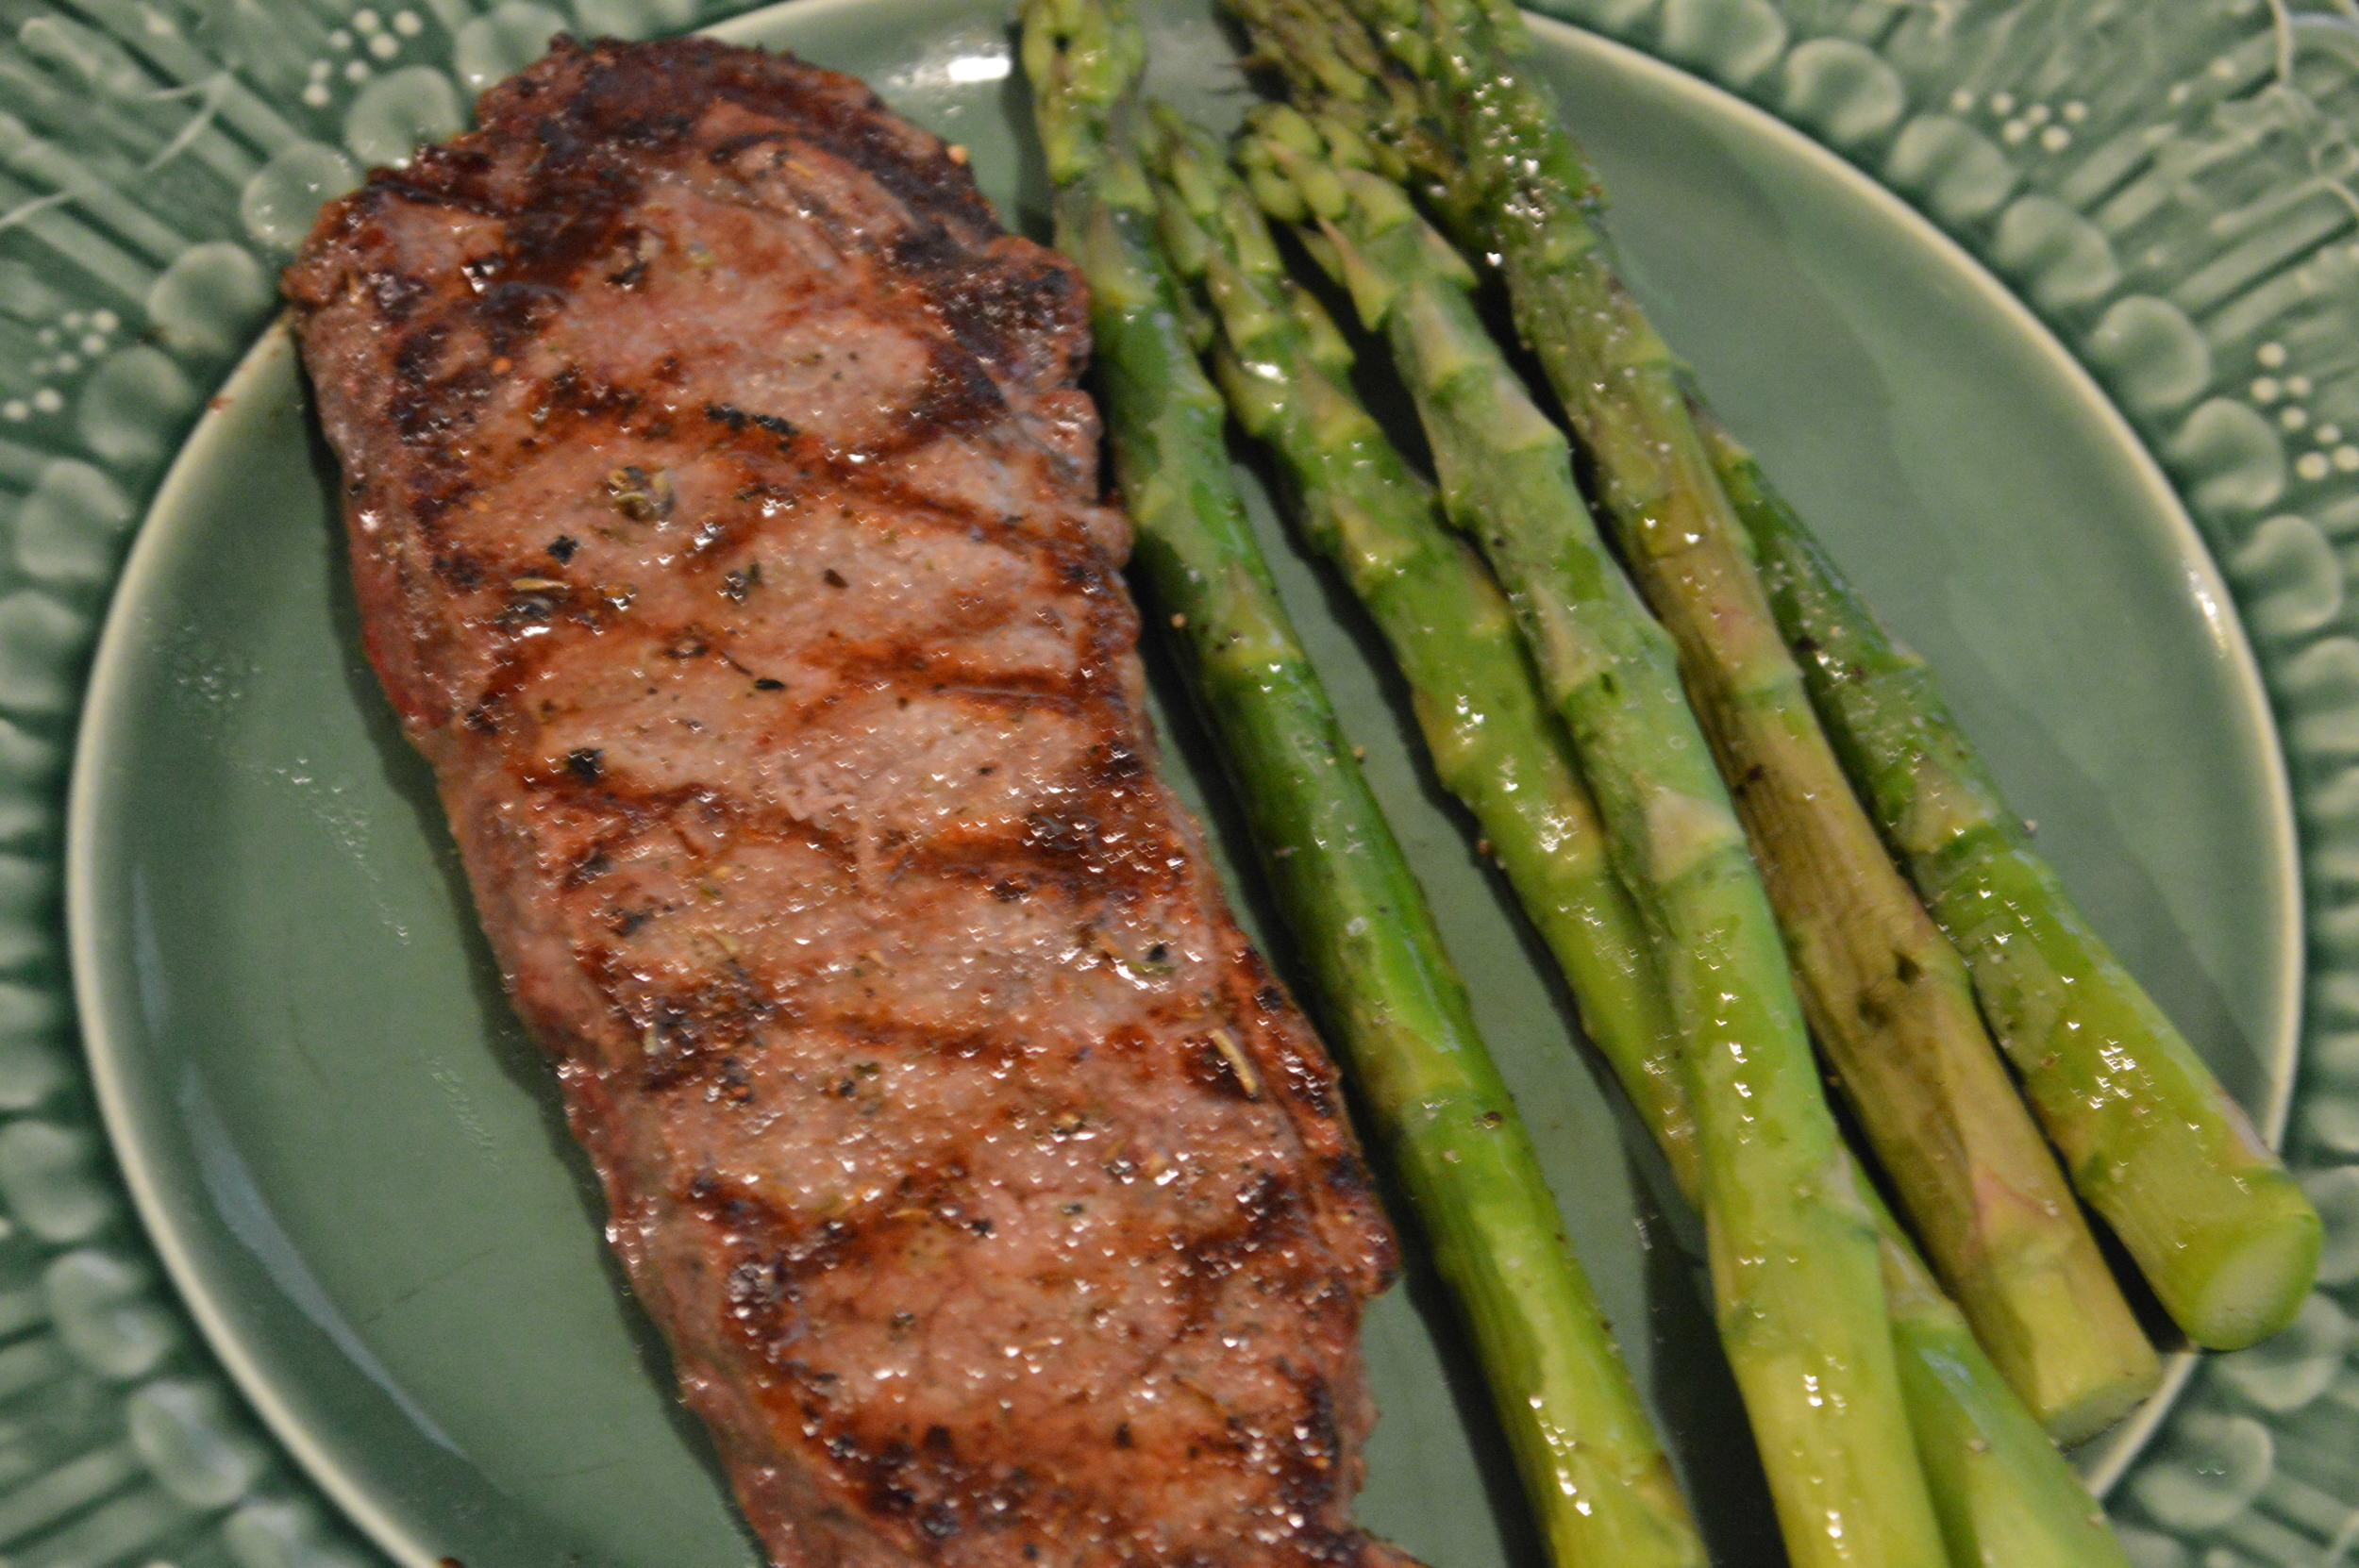 Steak & Asparagus Dinner